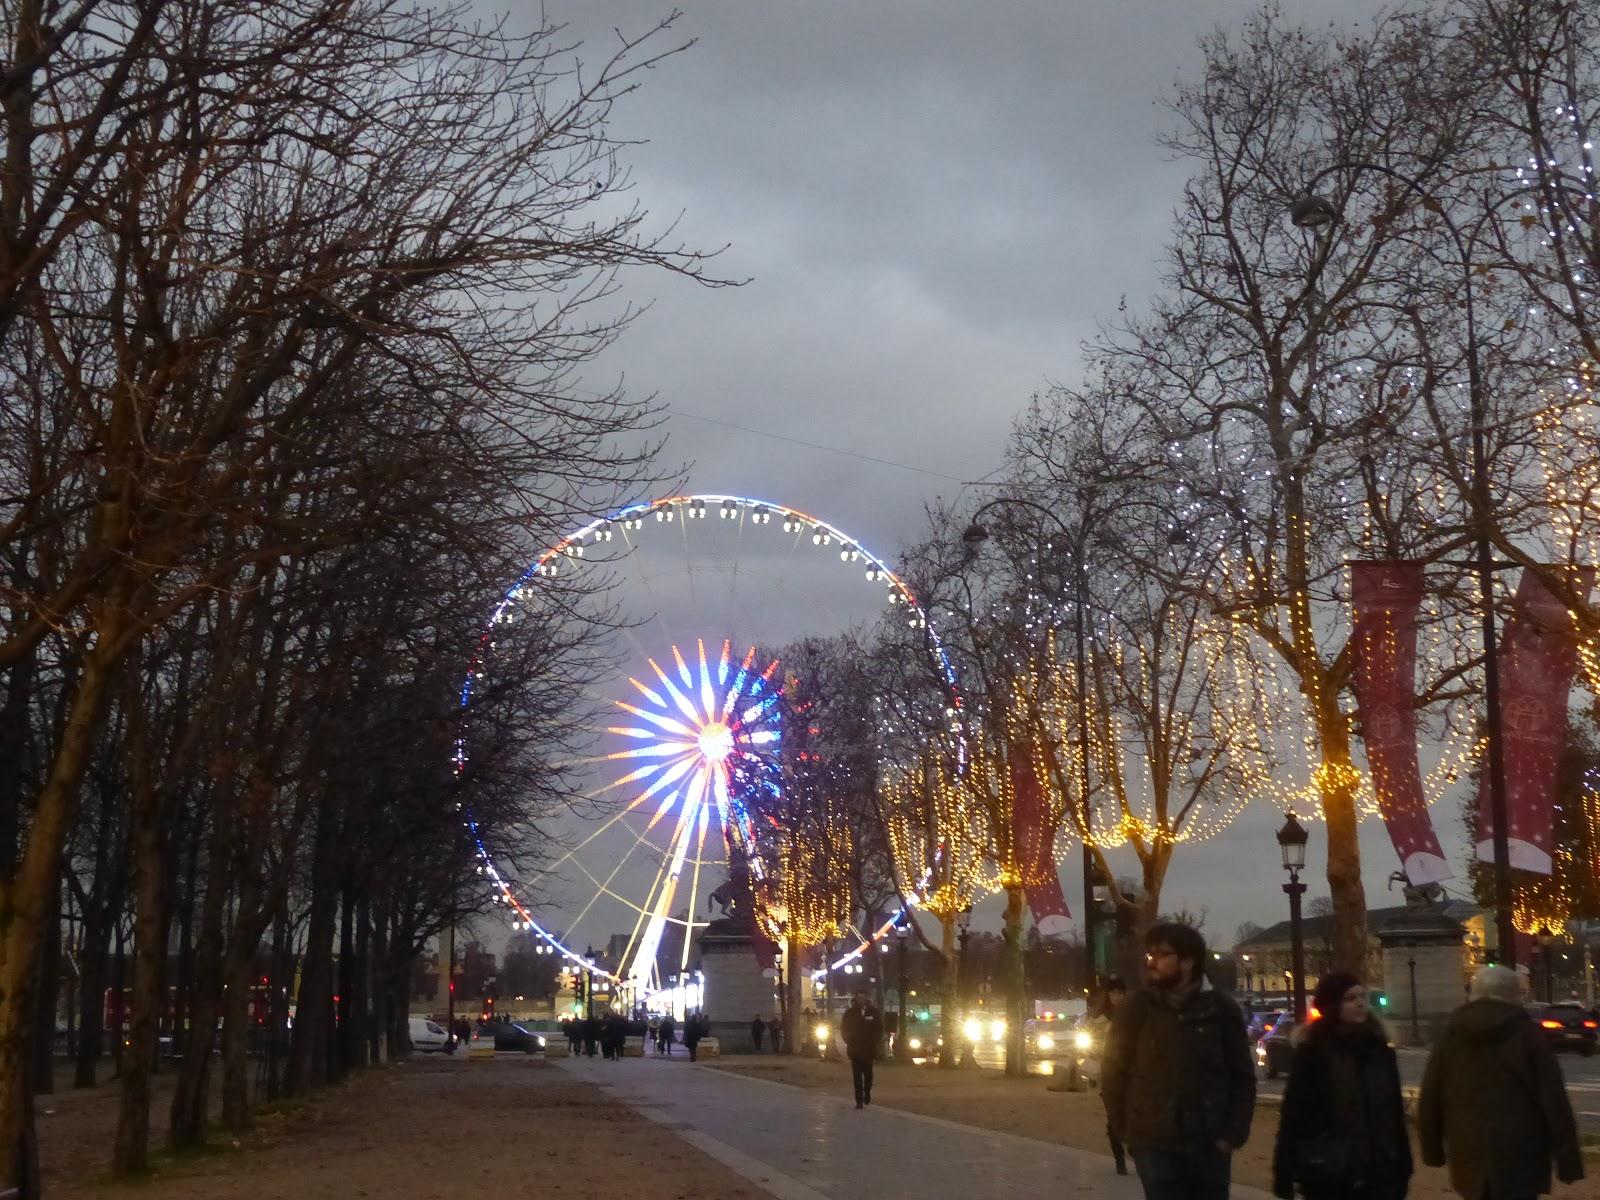 Les vitrines de noel des grands magasins et illuminations - Illumination noel paris 2017 ...